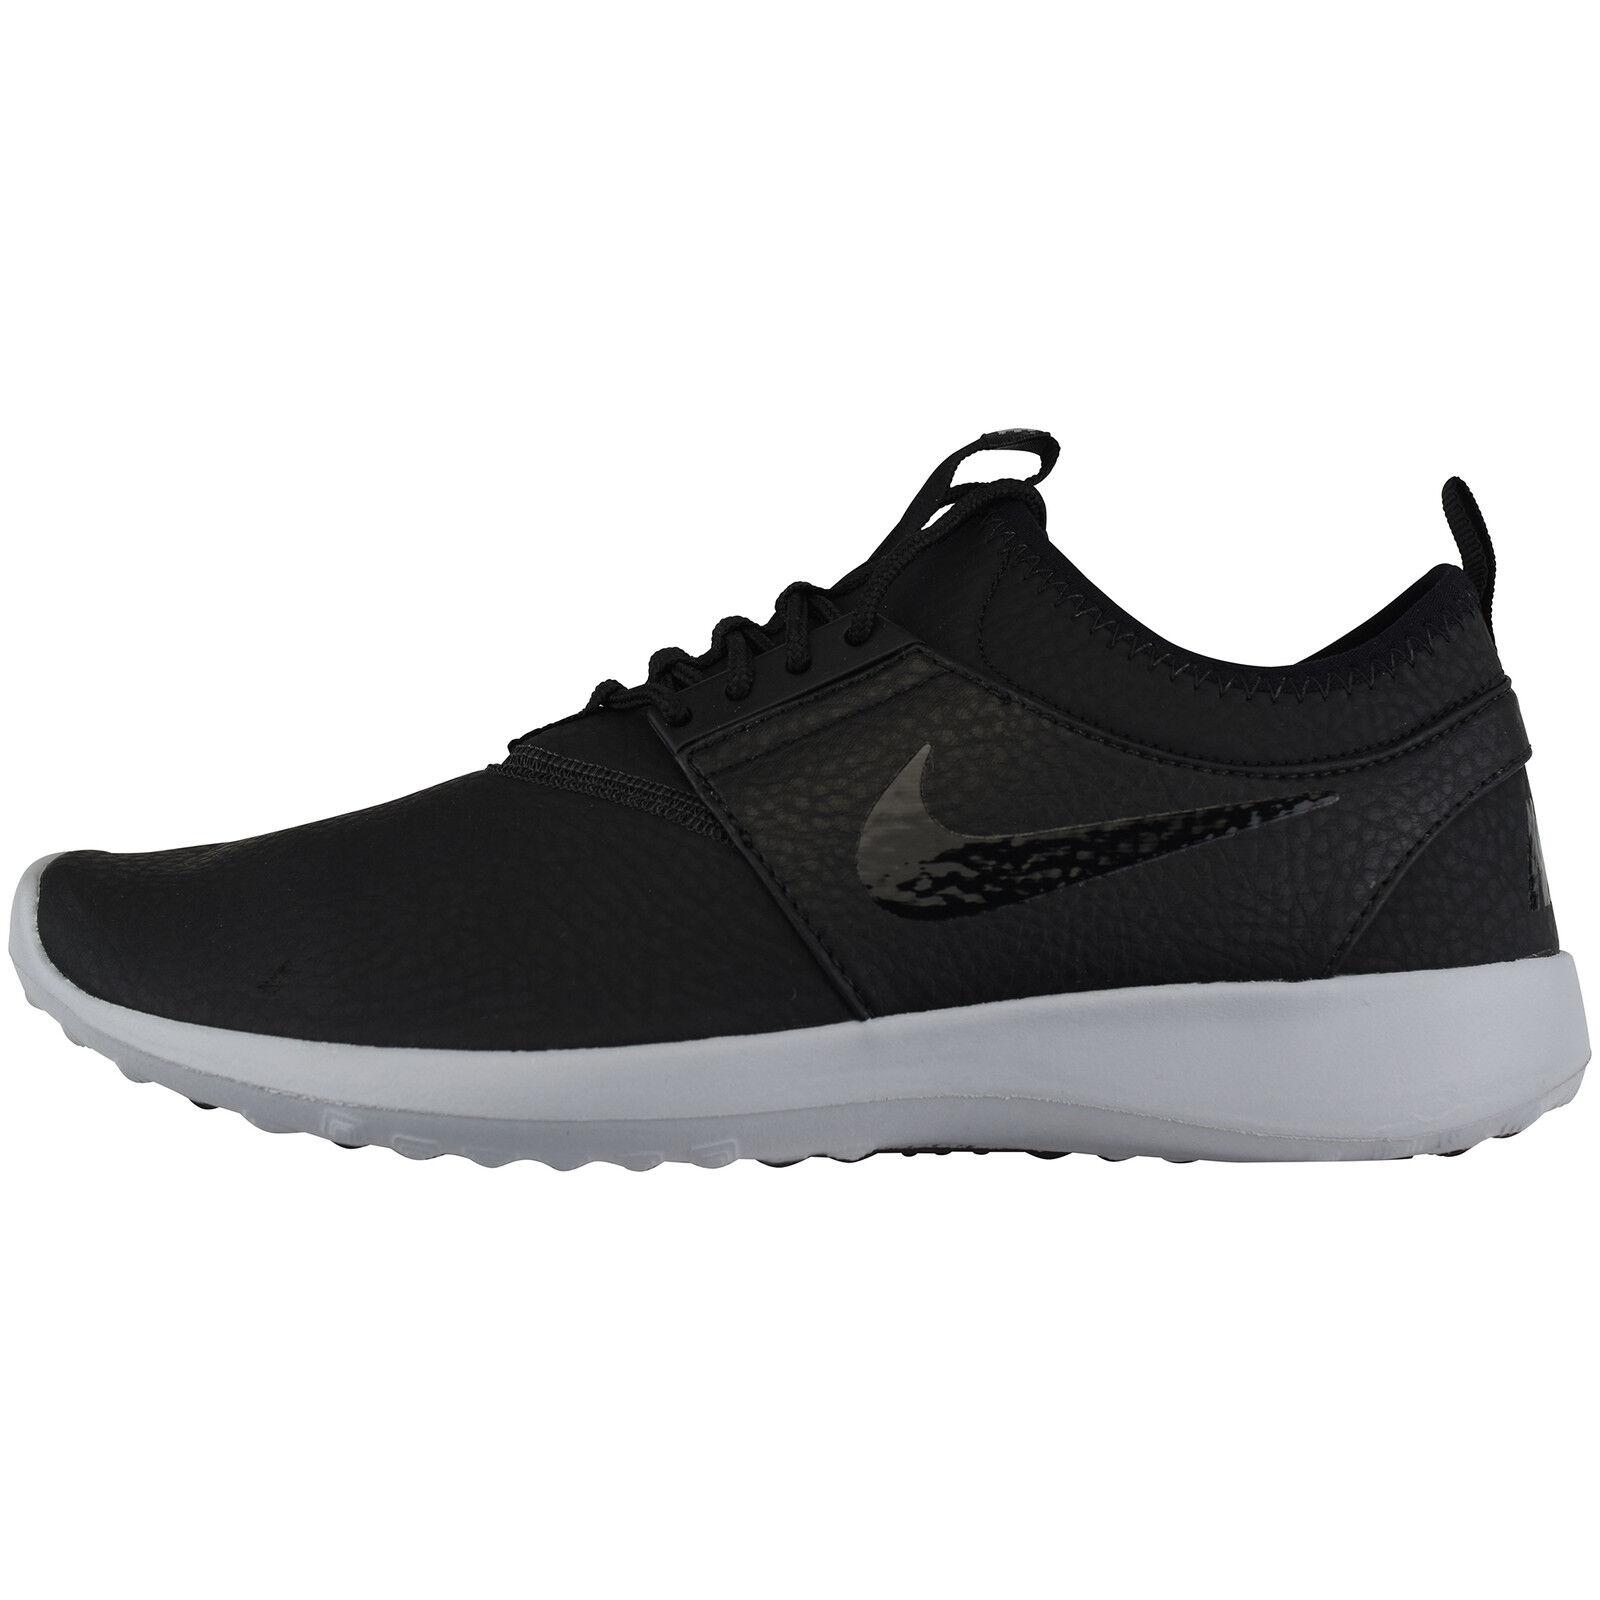 Wmns Nike Aspirantato PRM 844973-001 LIFESTYLE SCARPE JOGGING The latest discount shoes for men and women